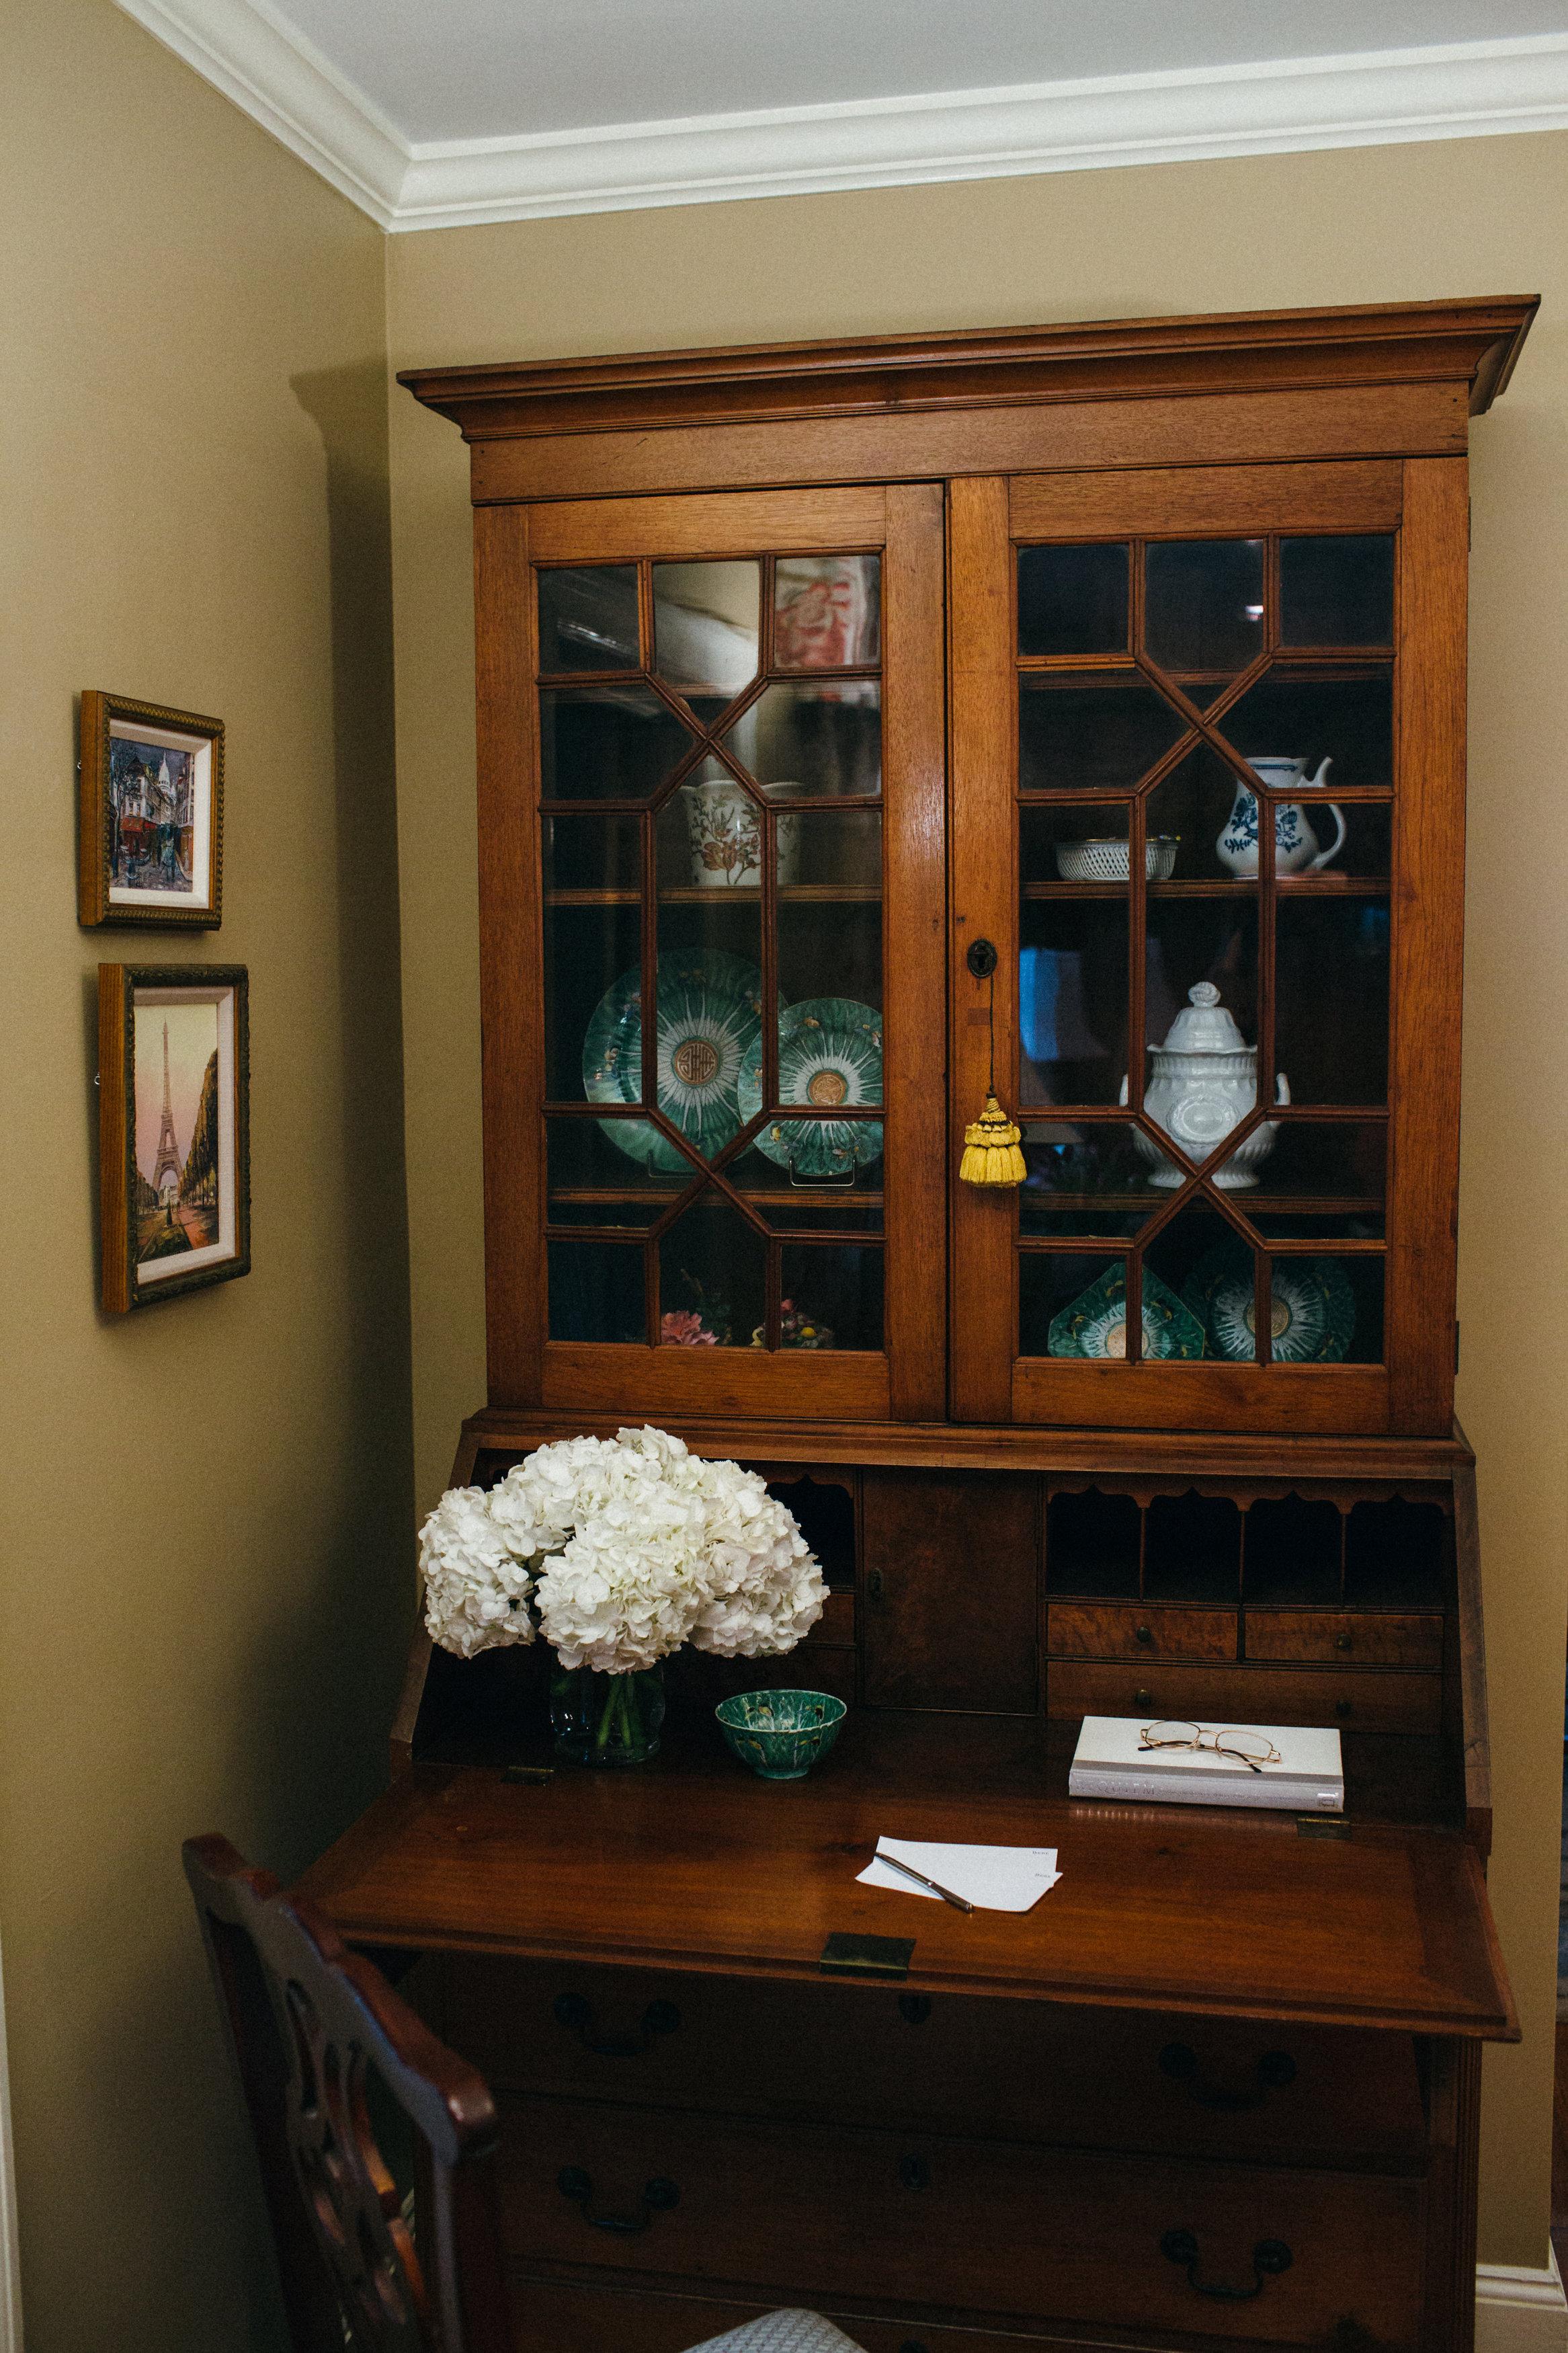 Jennifer Taylor Design - Tallahassee, Florida www.jennifertaylordesign.com